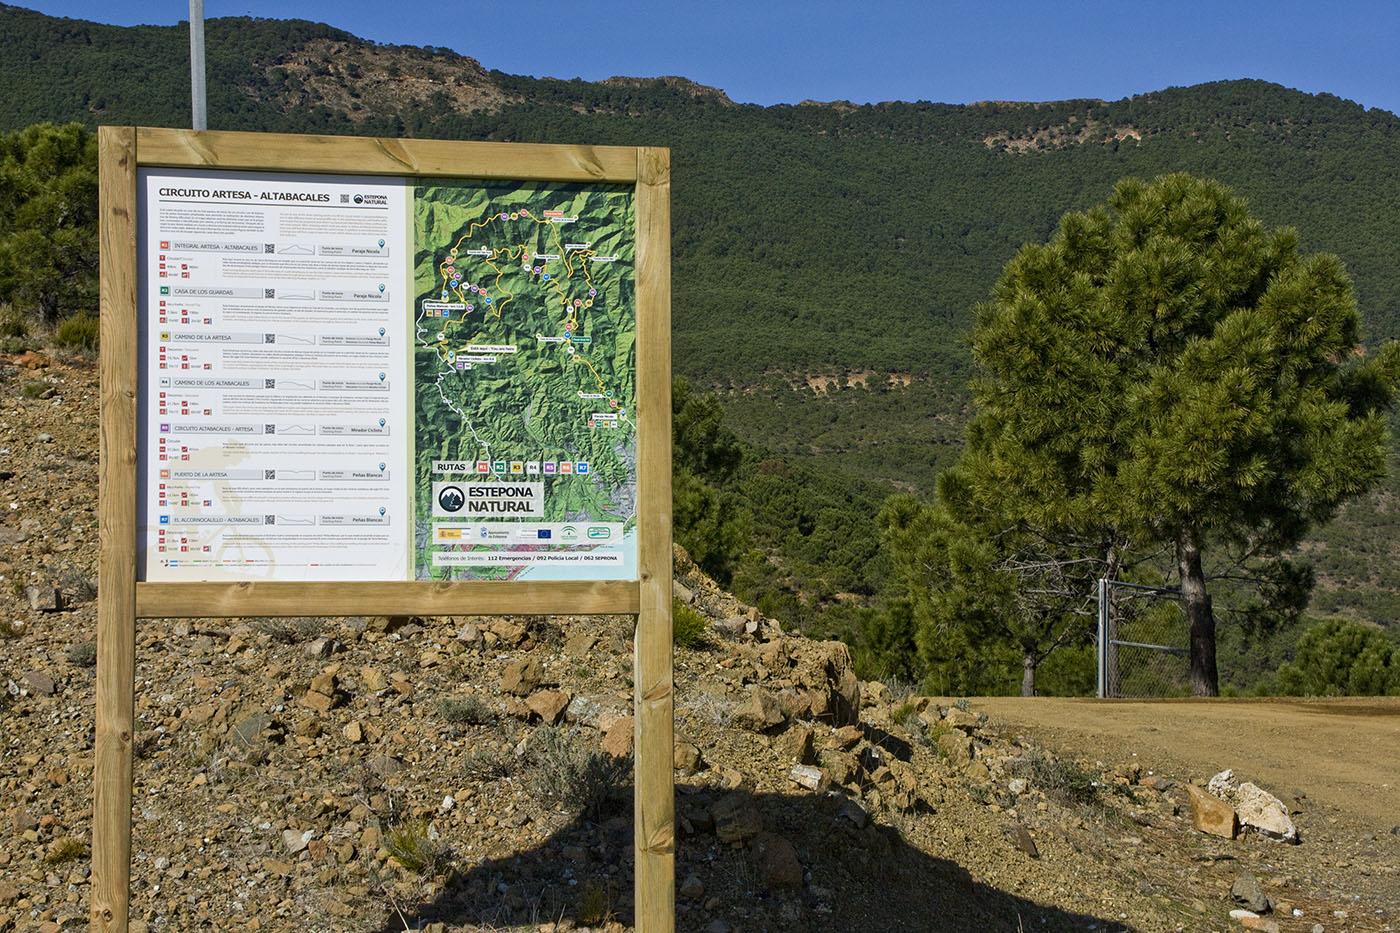 Diseño, fabricacion e instalación de rutas por espacios naturales